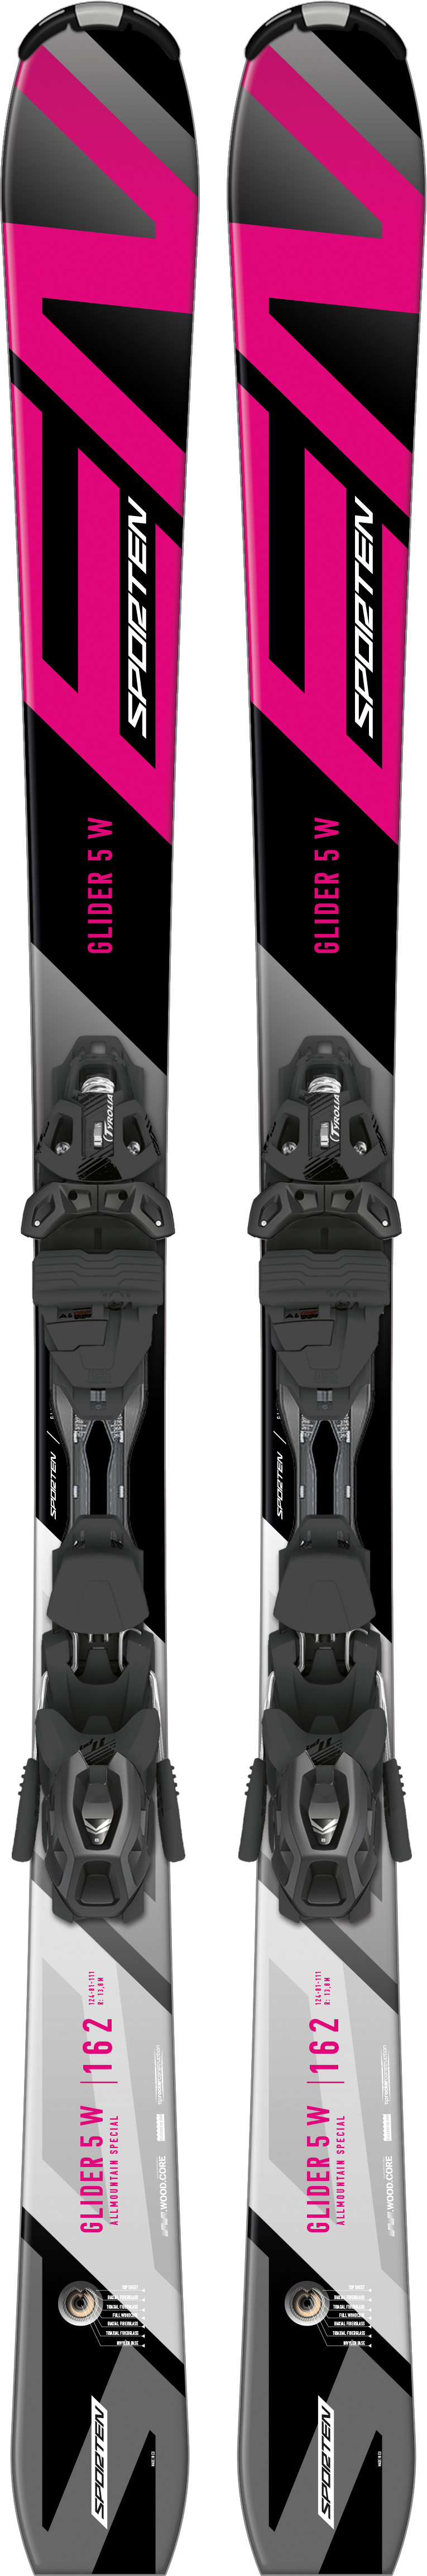 Glider 5 W B.jpg